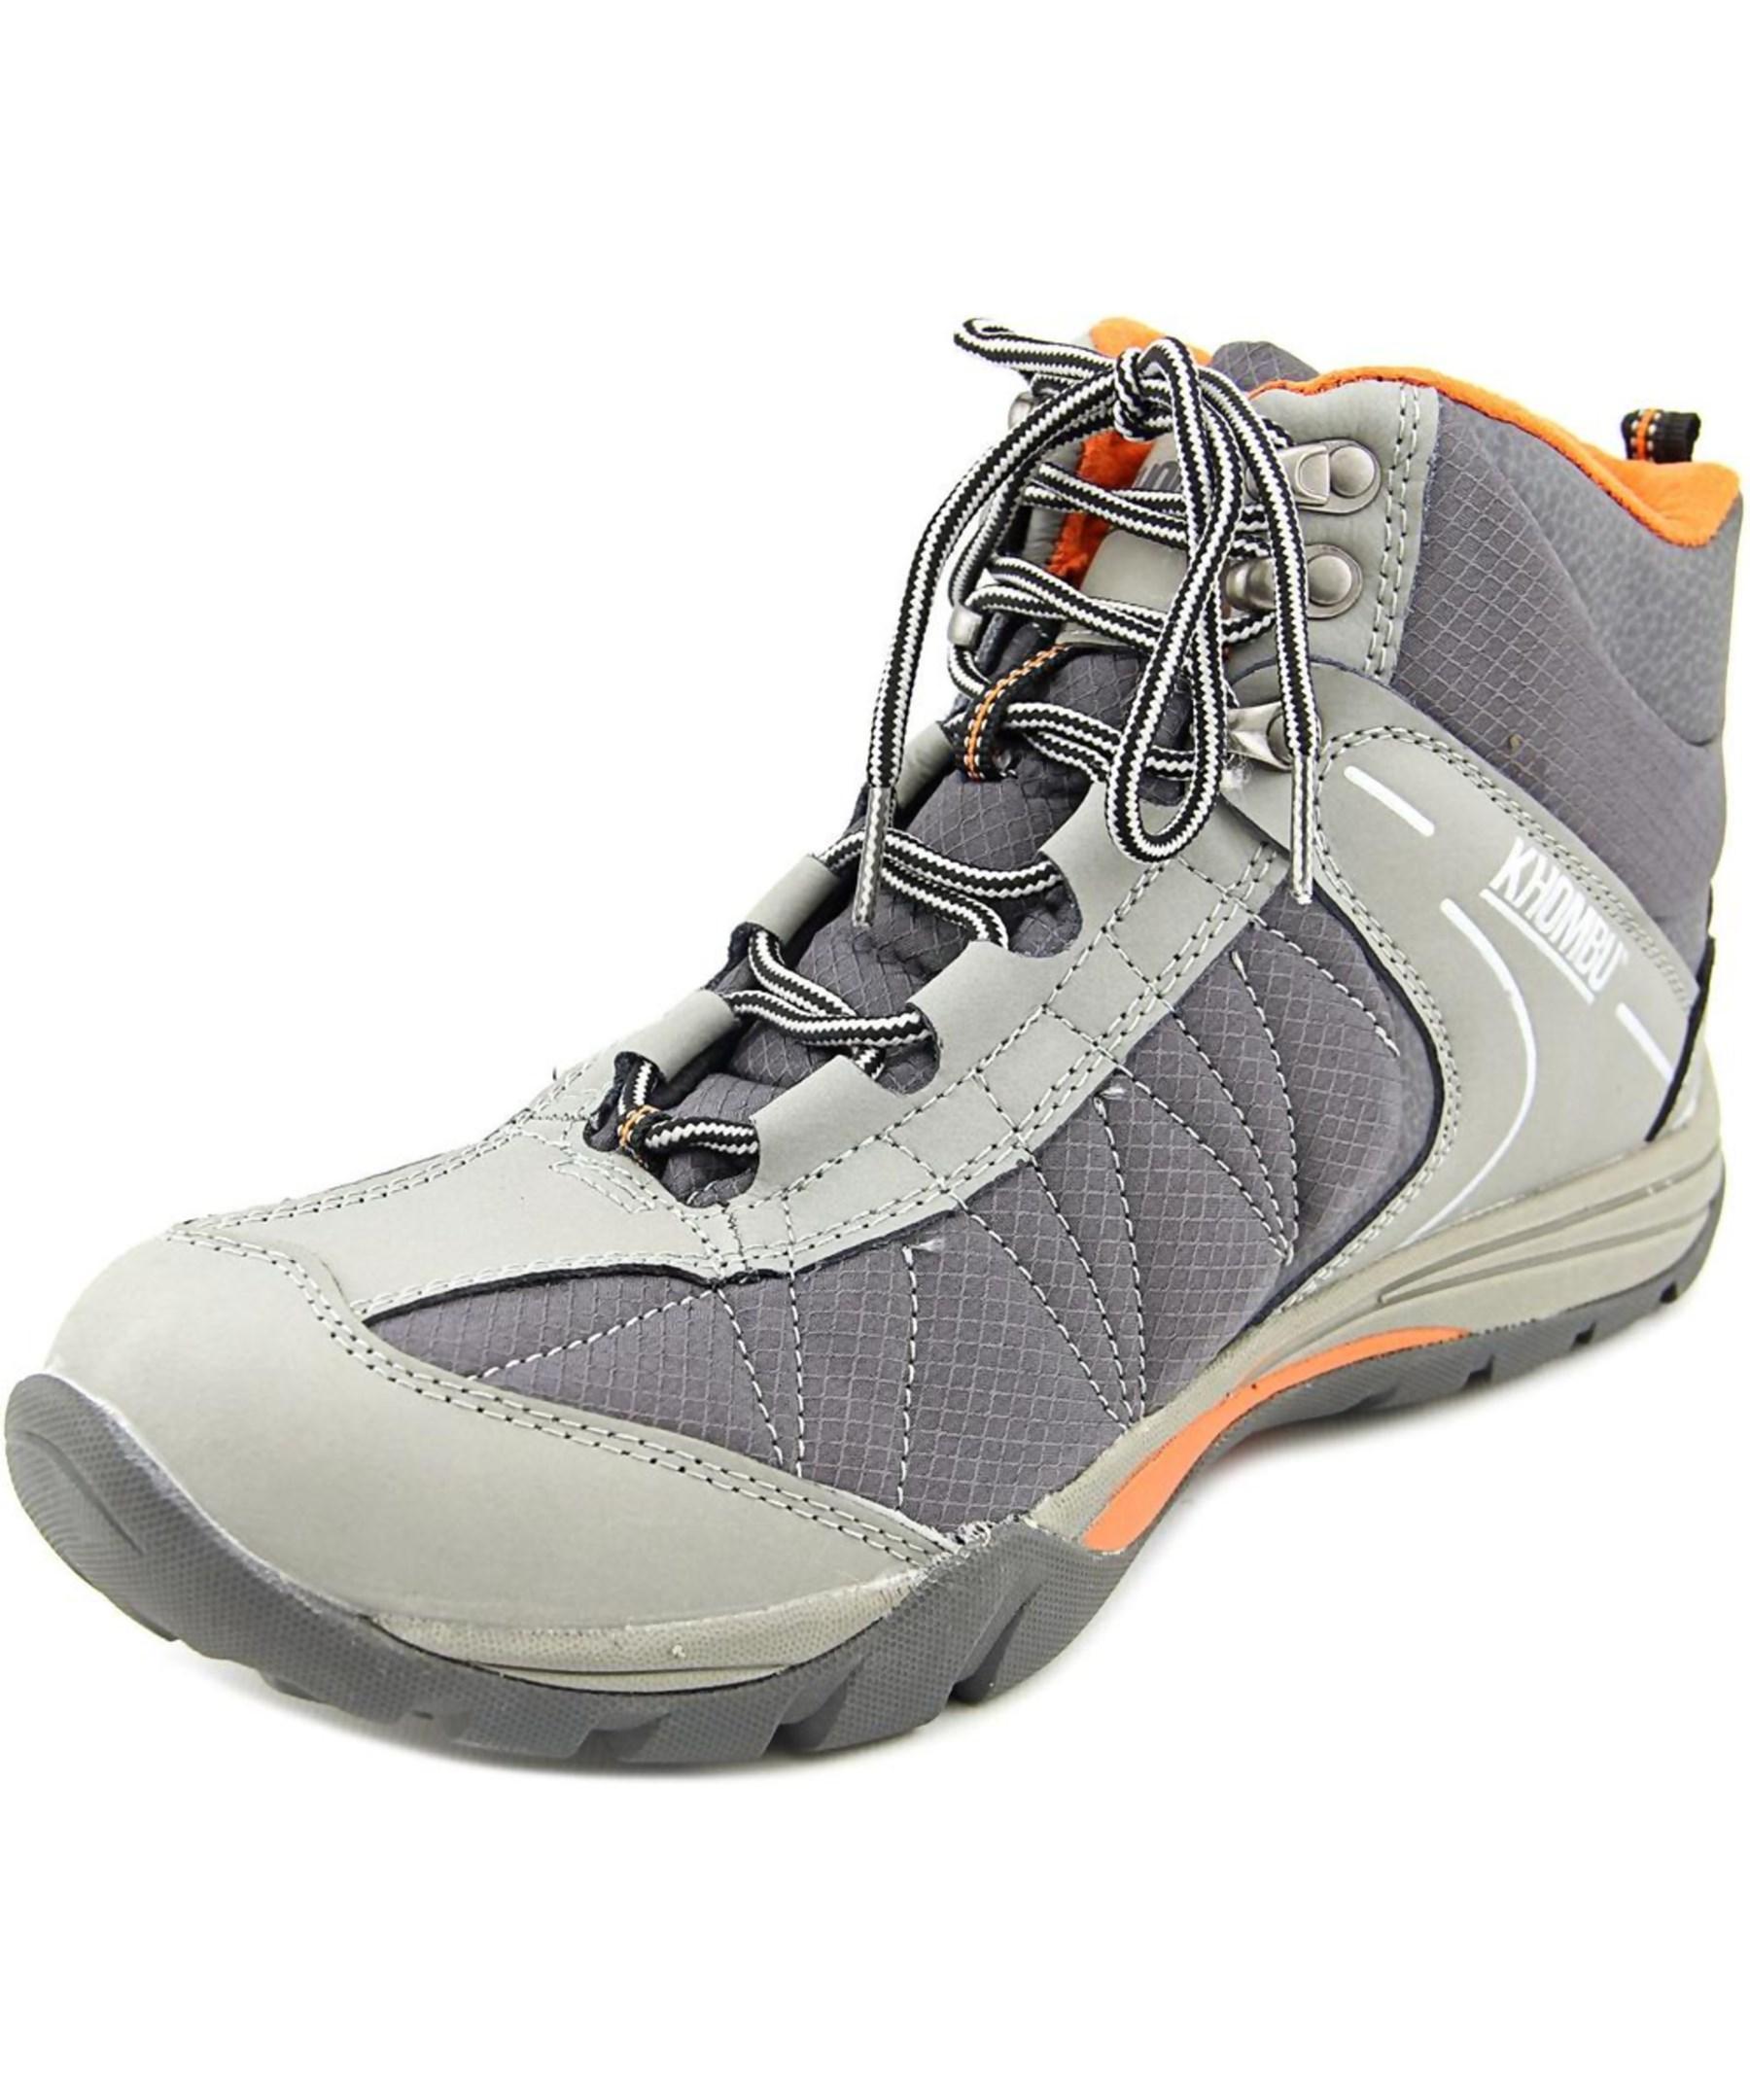 Khombu Running Shoes